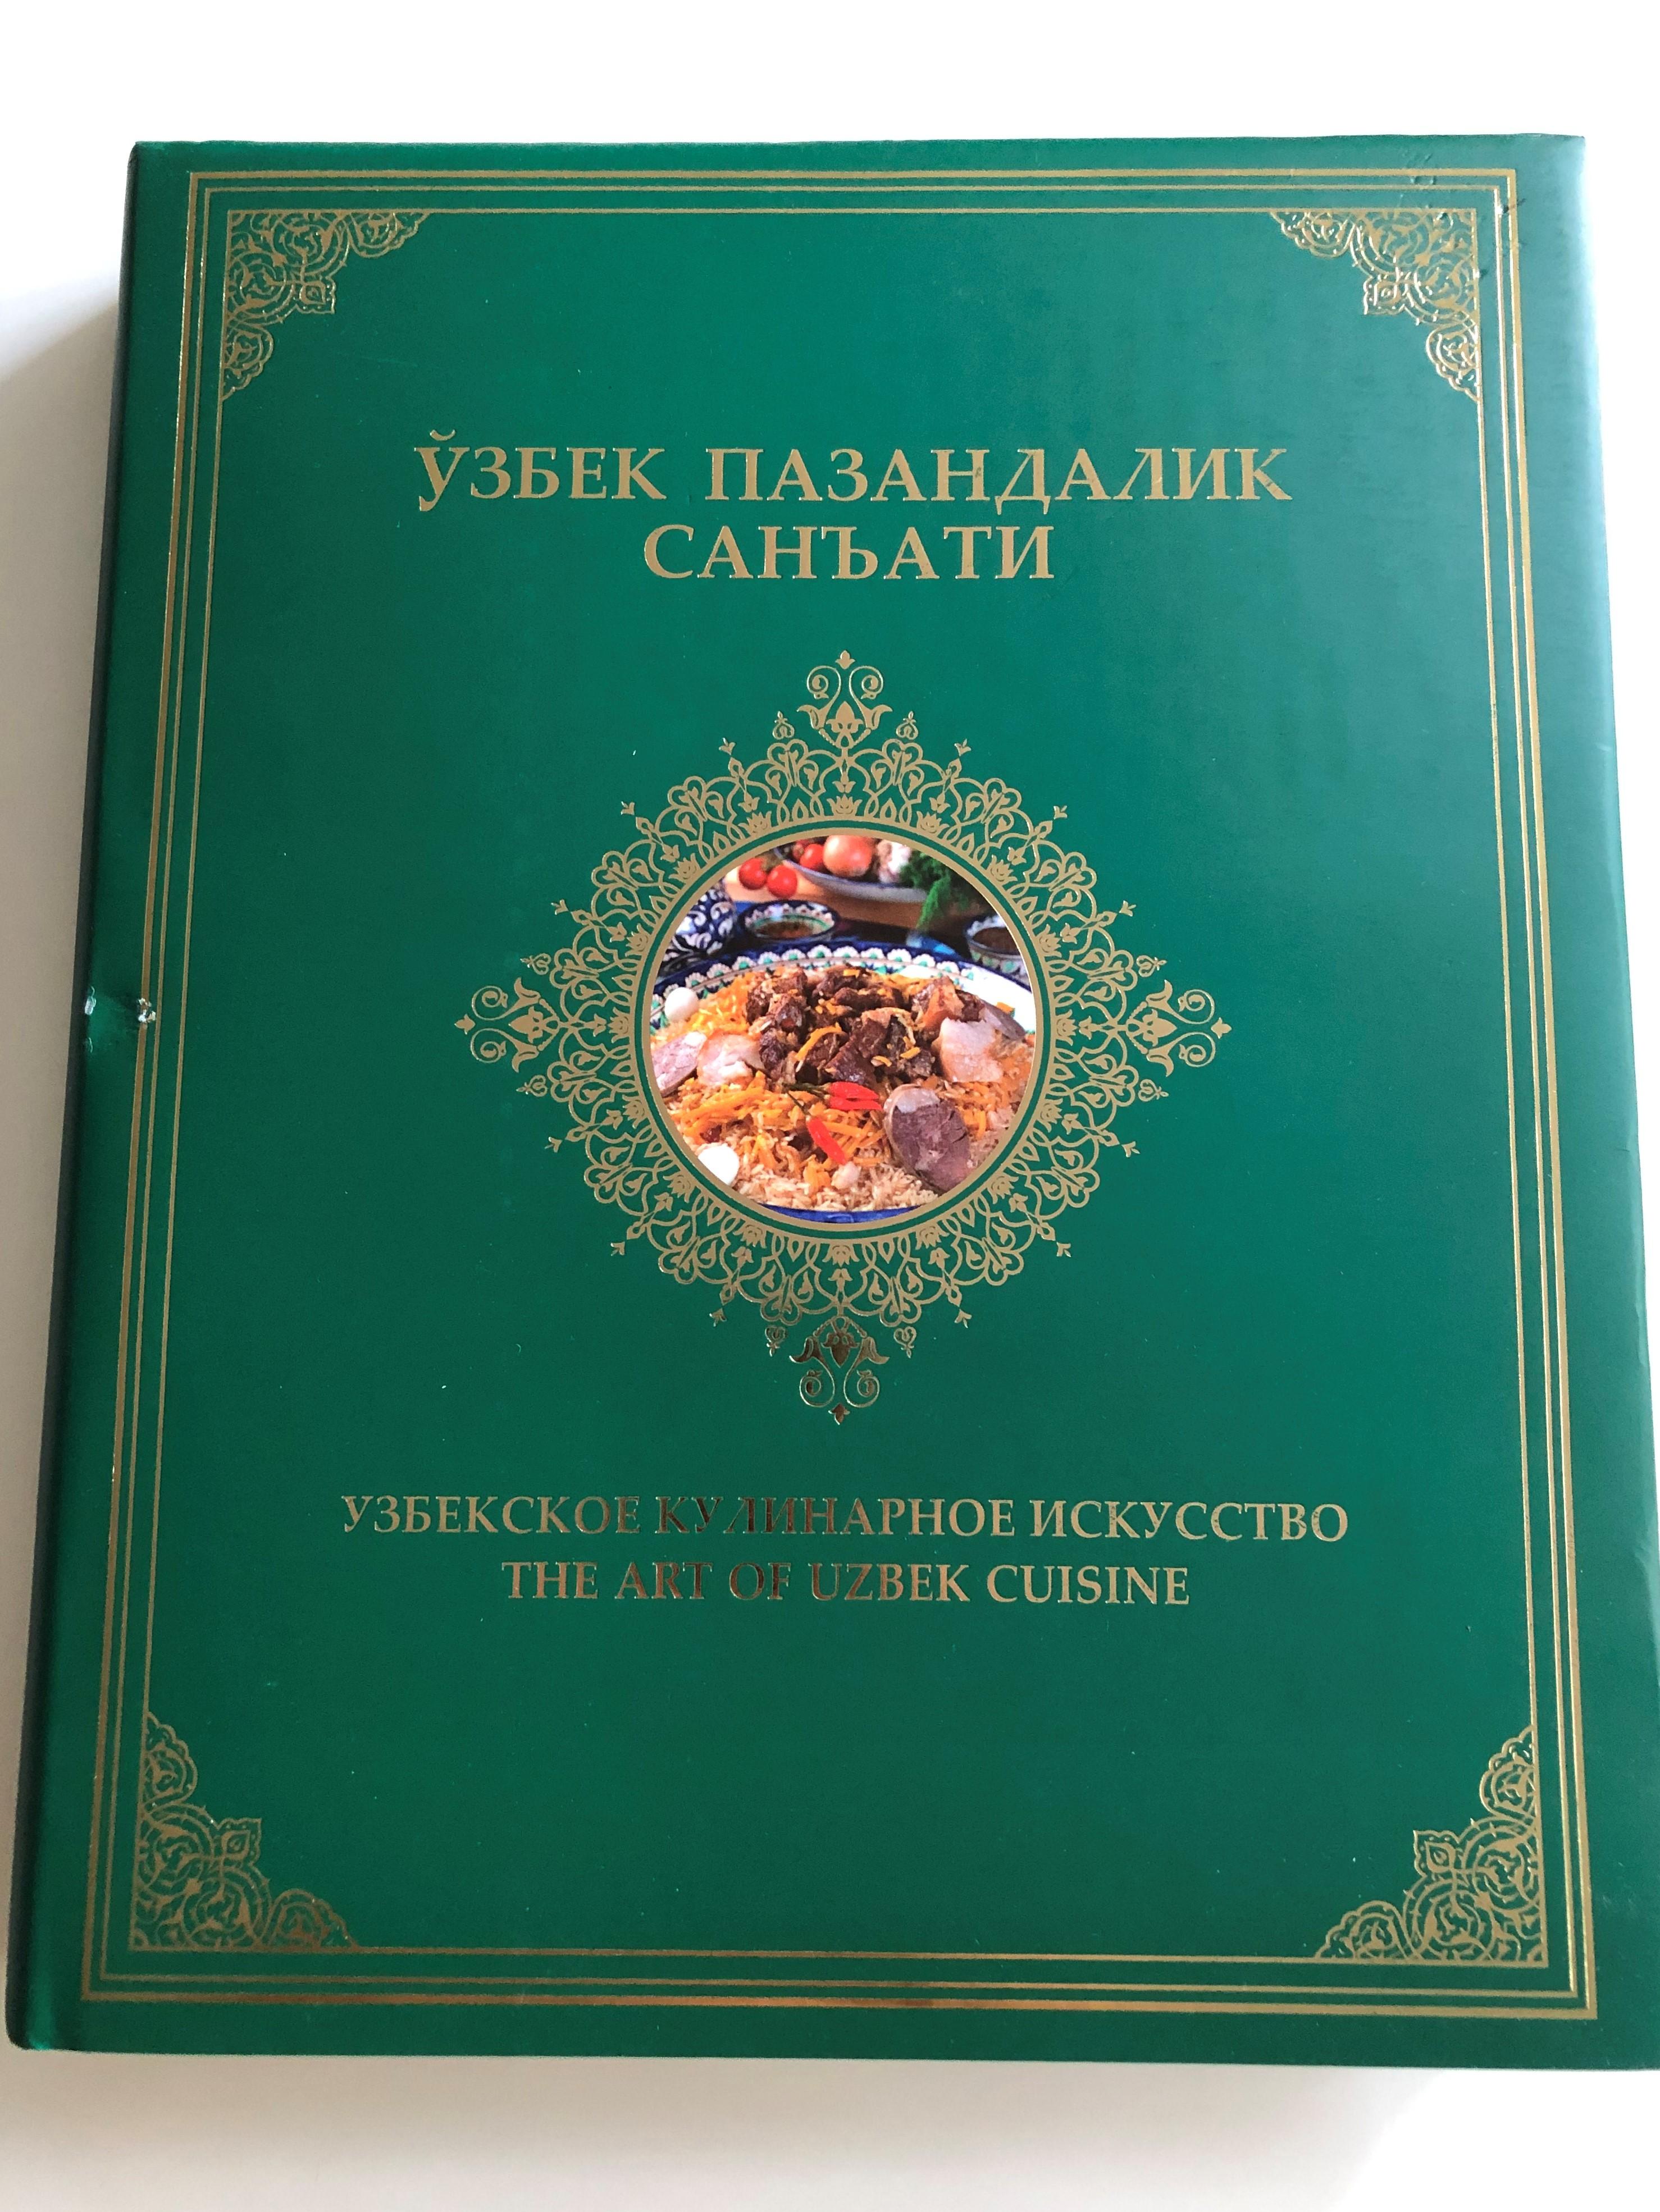 the-art-of-uzbek-cuisine-uzbek-russian-english-edition-hardcover-baktria-press-toshkent-2016-recipes-culture-cuisine-art-1-.jpg